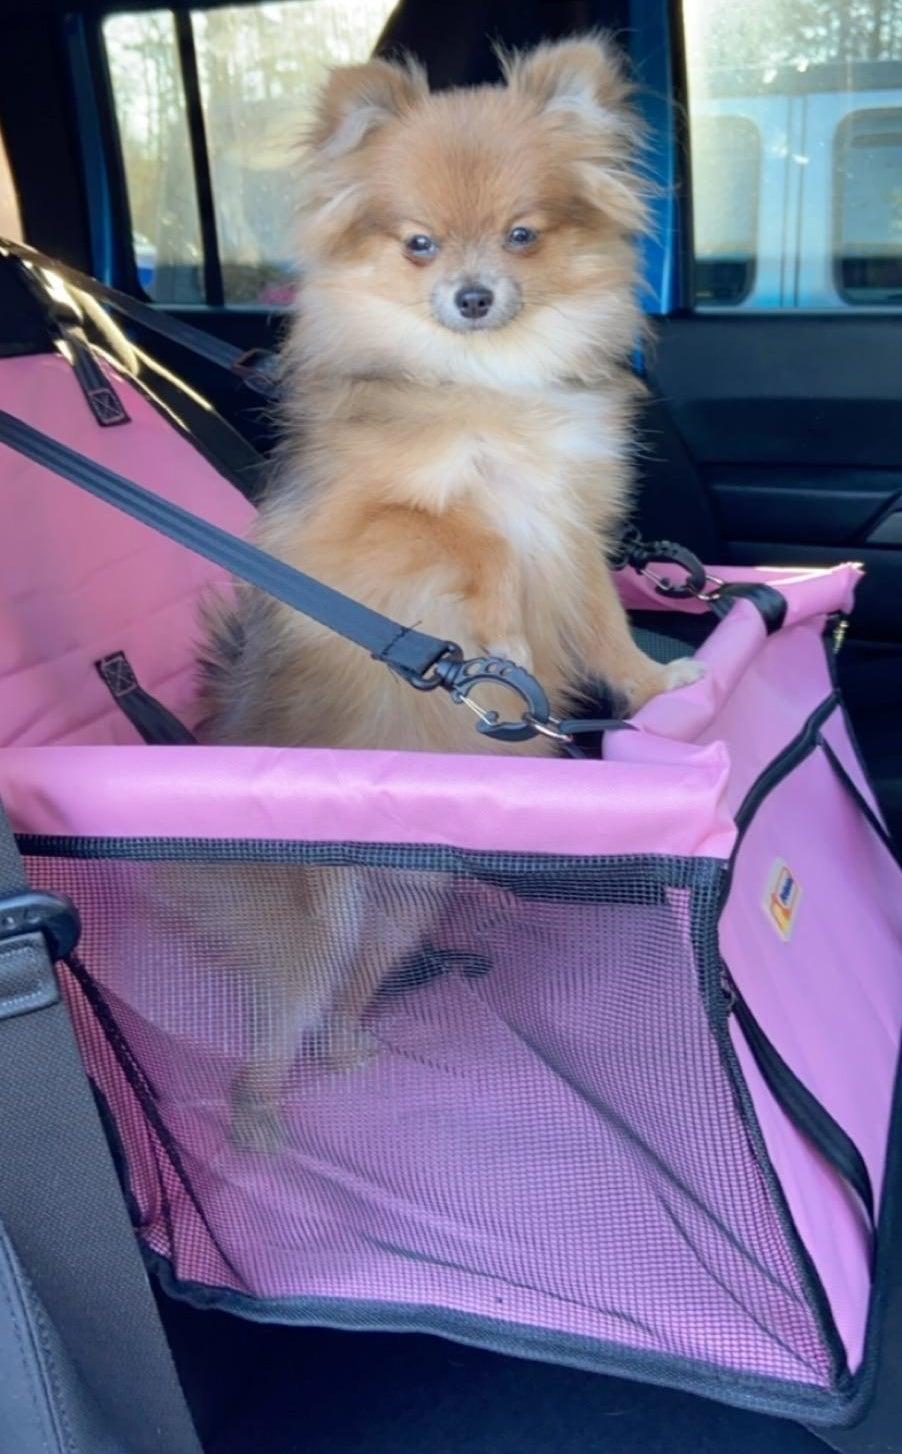 Tan Pomeranian in bright pink car seat